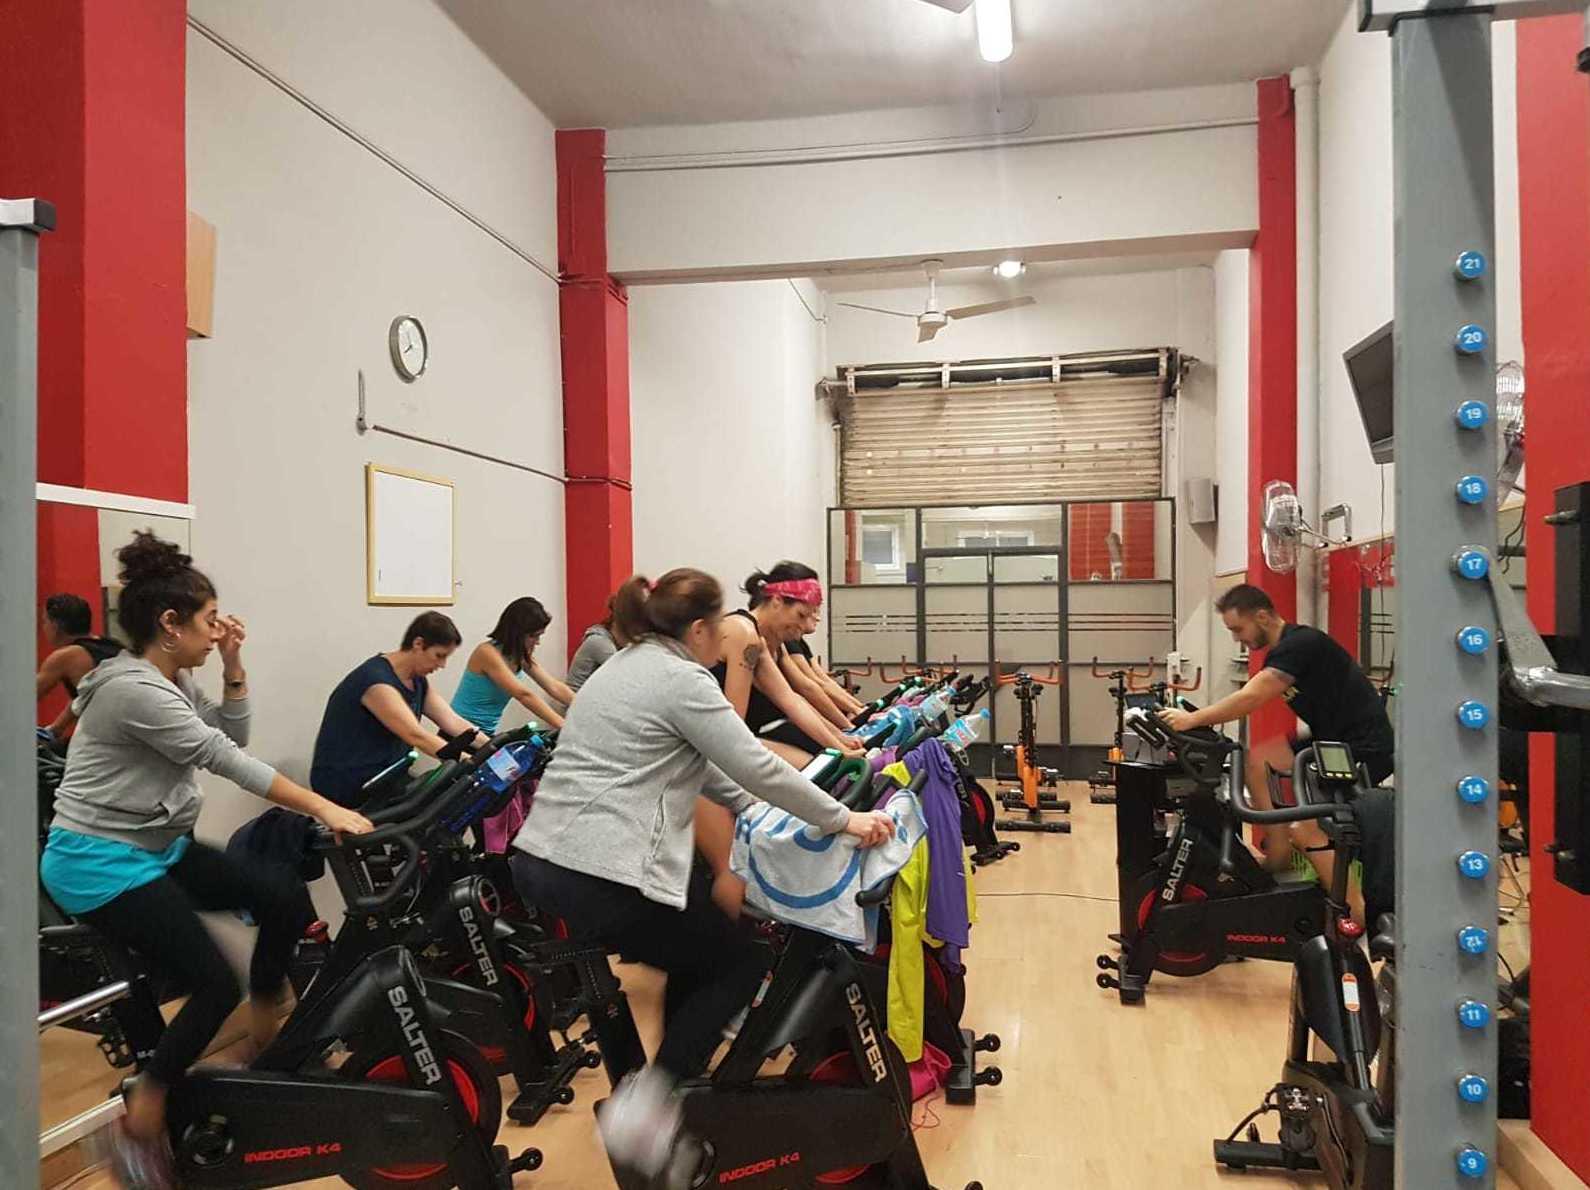 Spinning para fortalecer tus piernas y tu sistema cardiovascular!